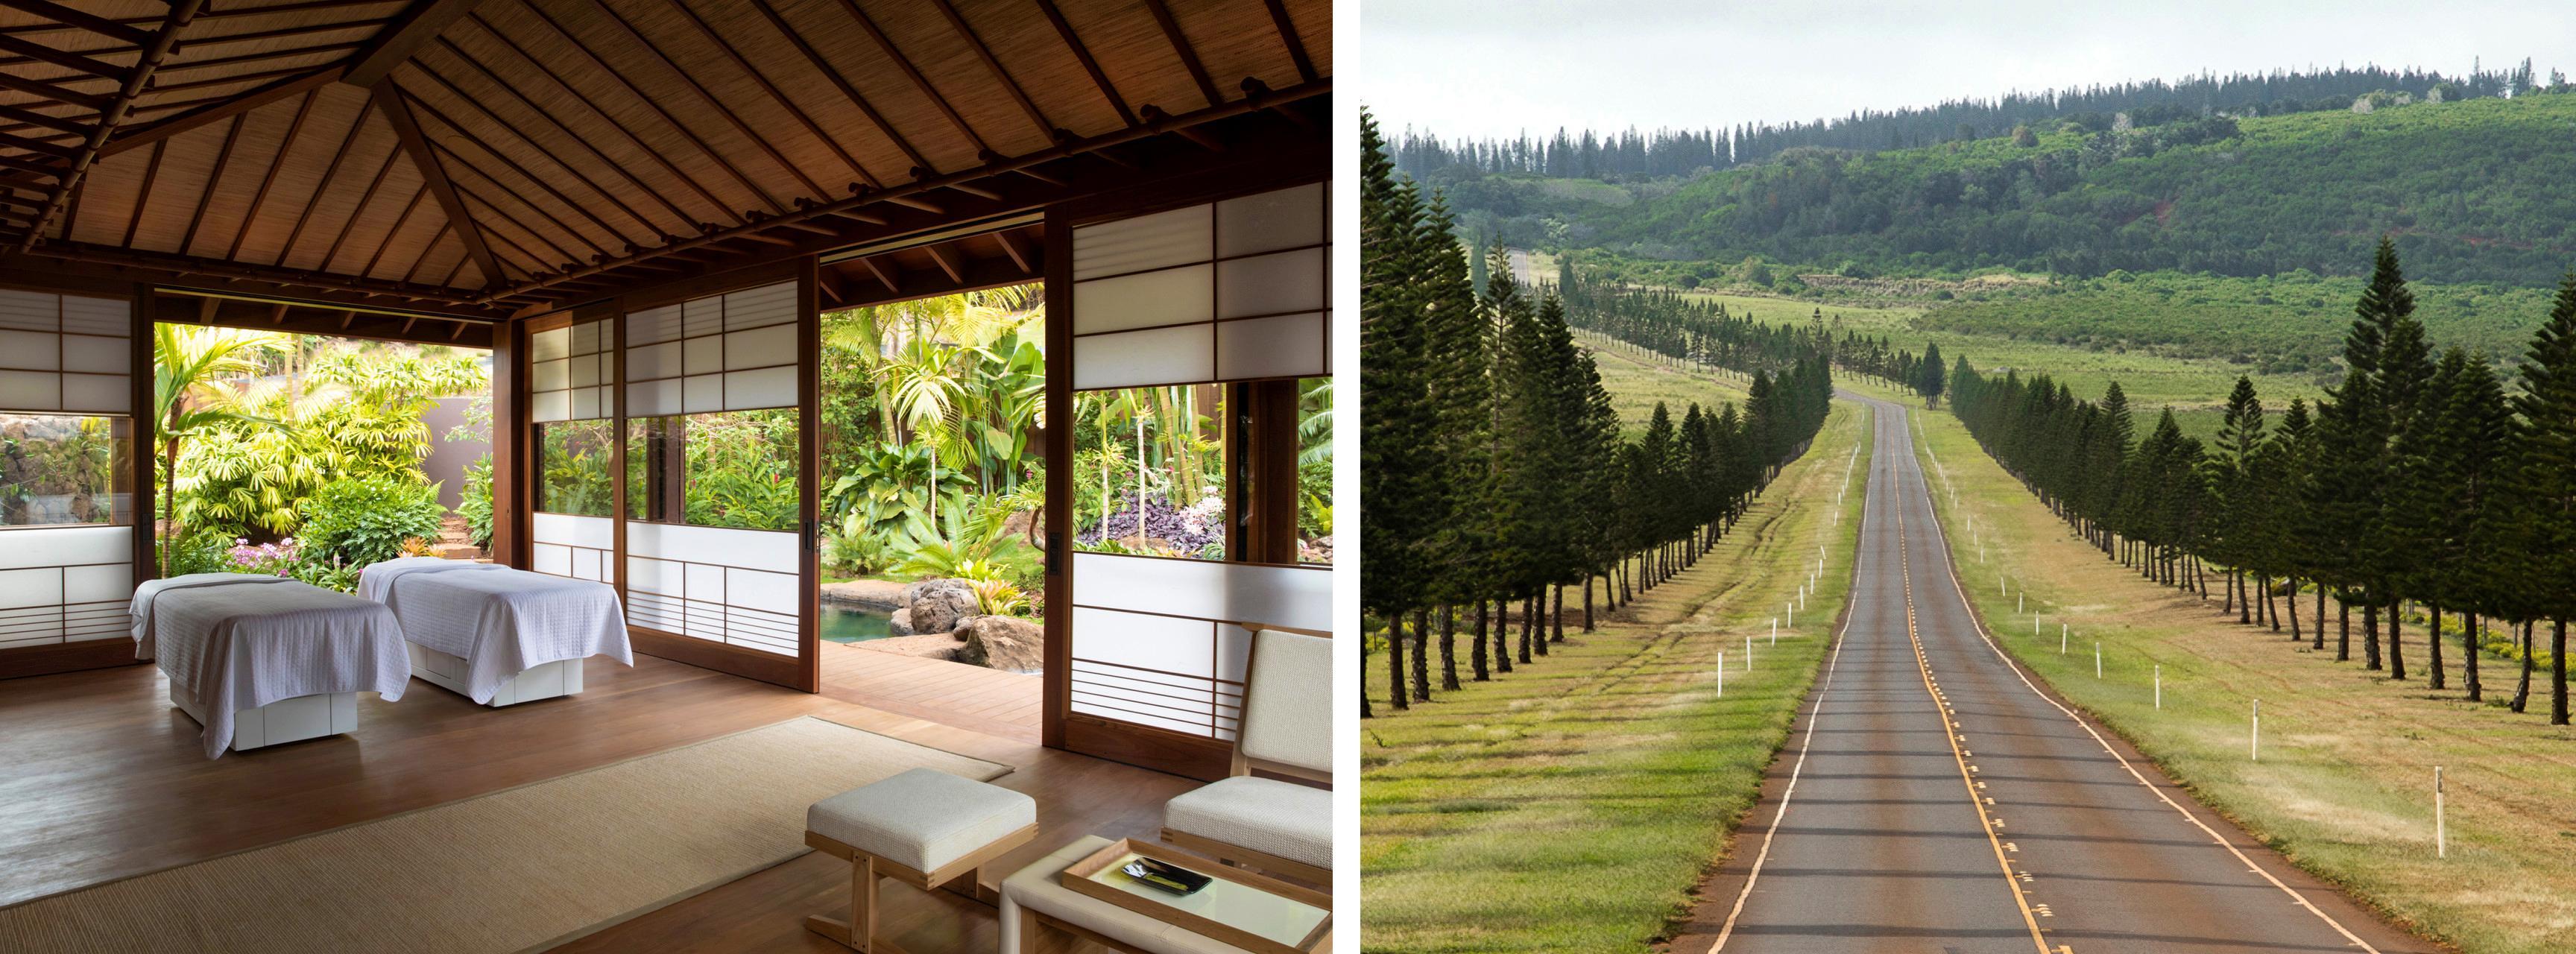 bertie-spa-road-ellison-sensei-spa-Lanai-Hawaii3-no-credit